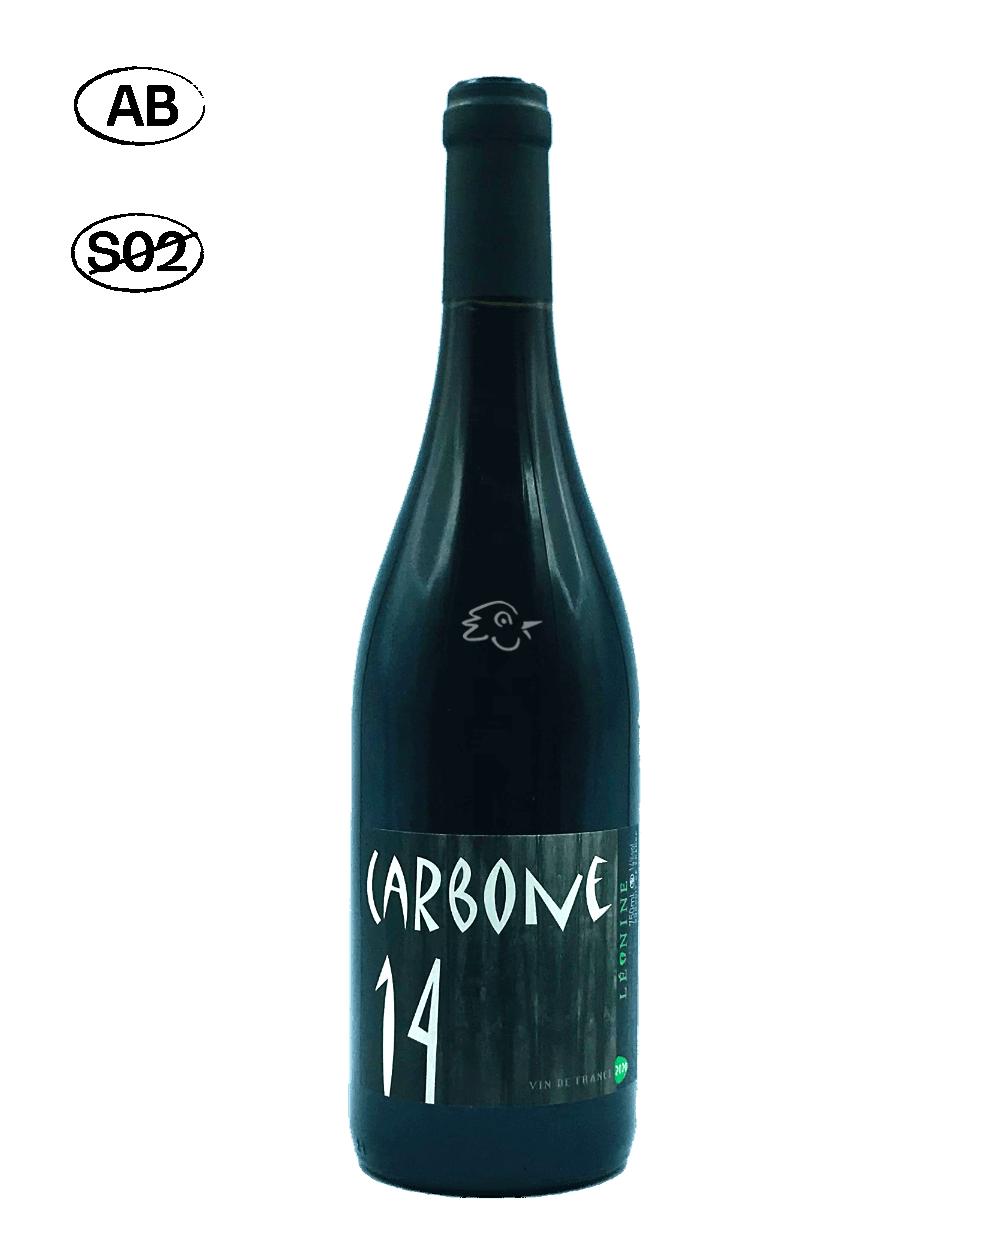 Domaine Léonine - Stéphane Morin - Carbone 14 2020 - Avintures